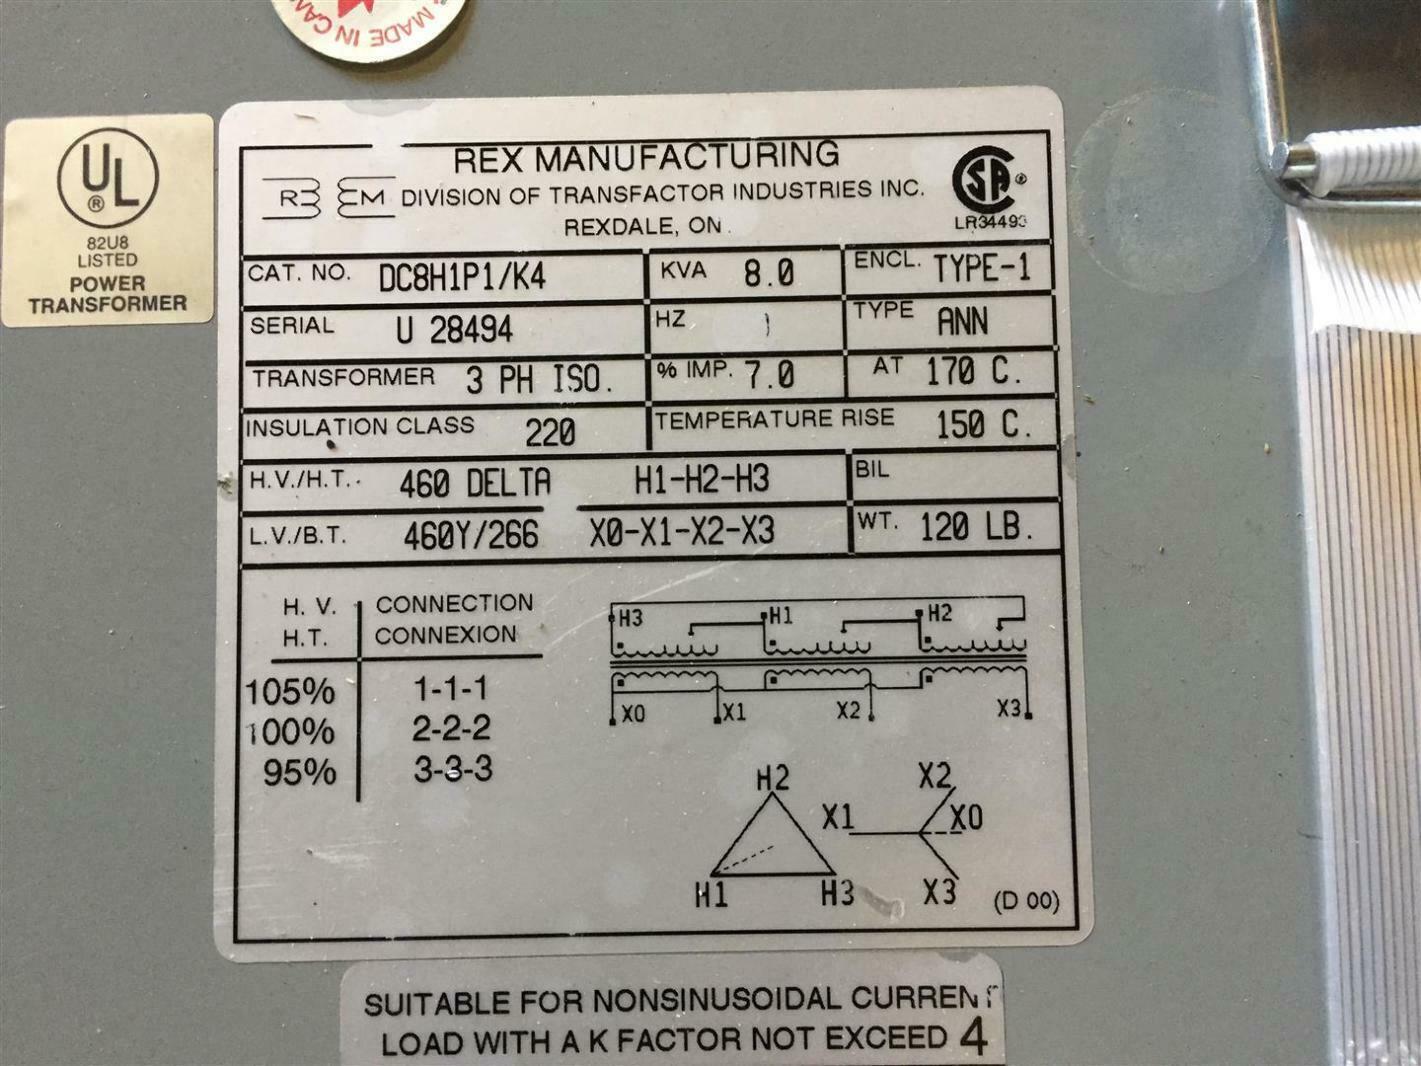 Astonishing Rex Manufacturing Transformer Wiring Diagram Online Wiring Diagram Wiring Digital Resources Sulfshebarightsorg